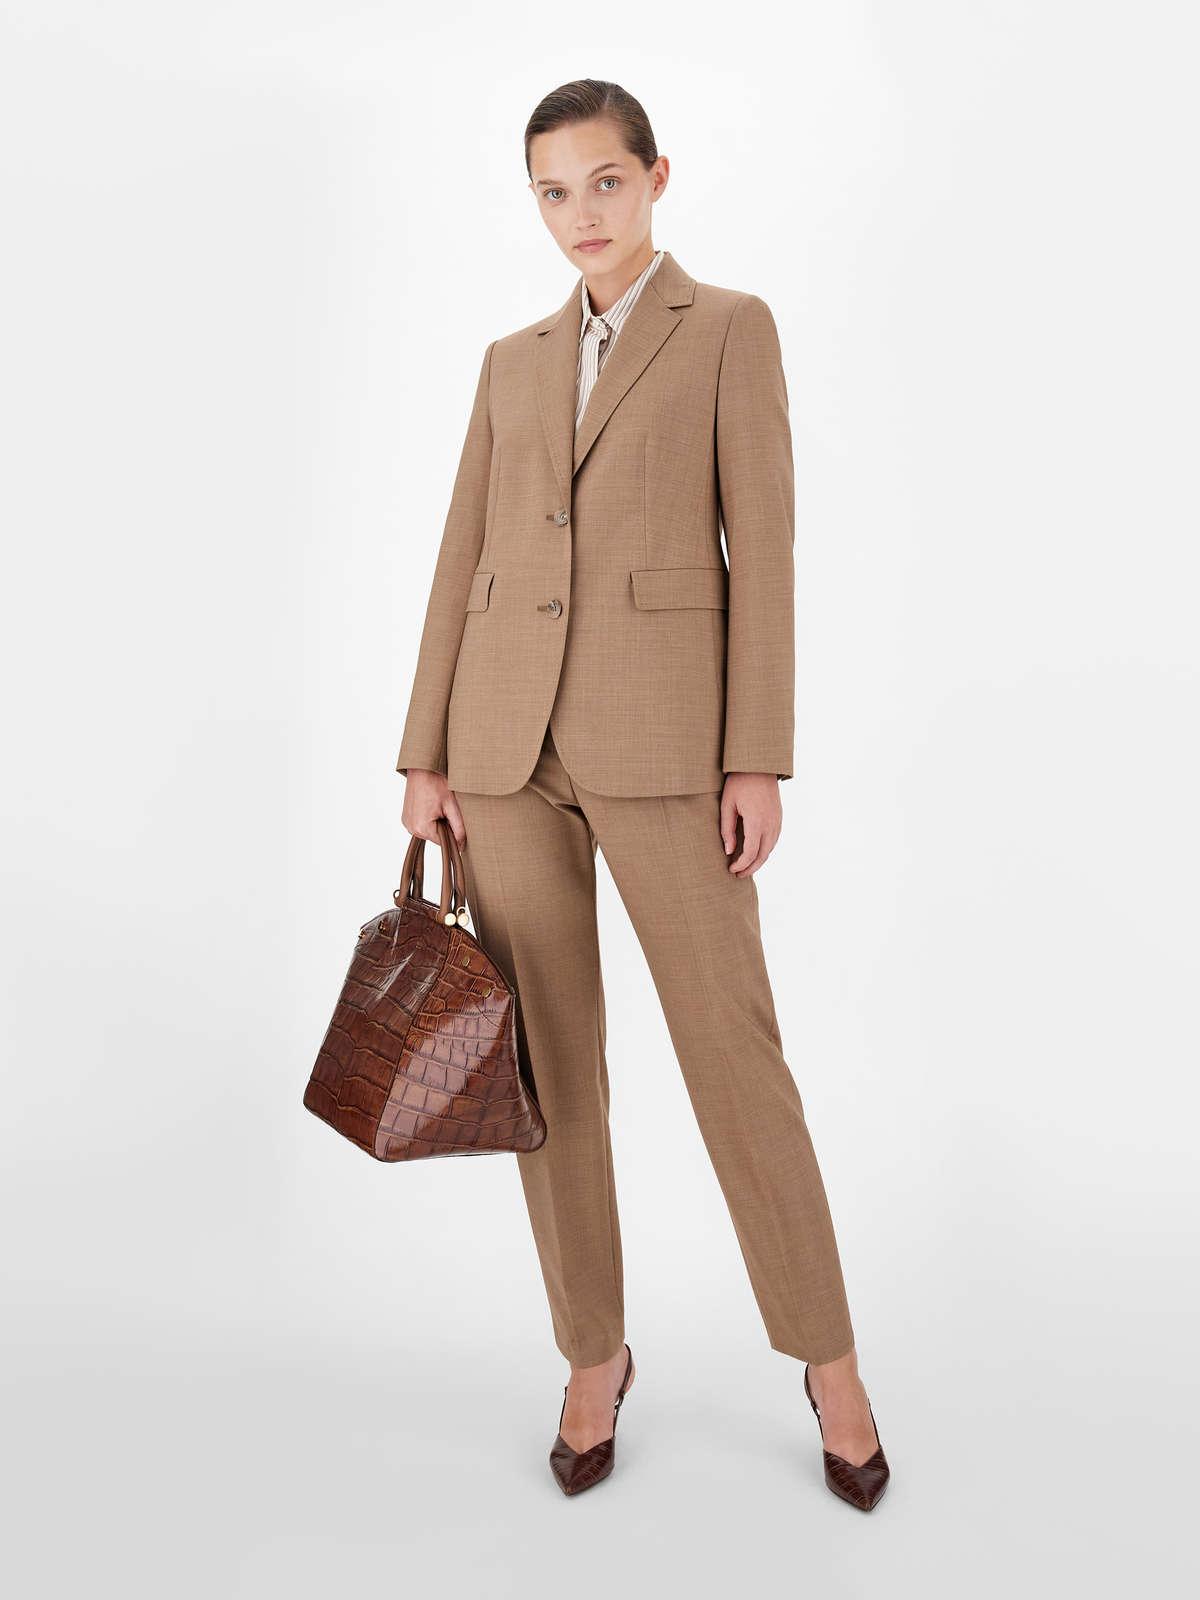 Wool canvas trousers - Max Mara